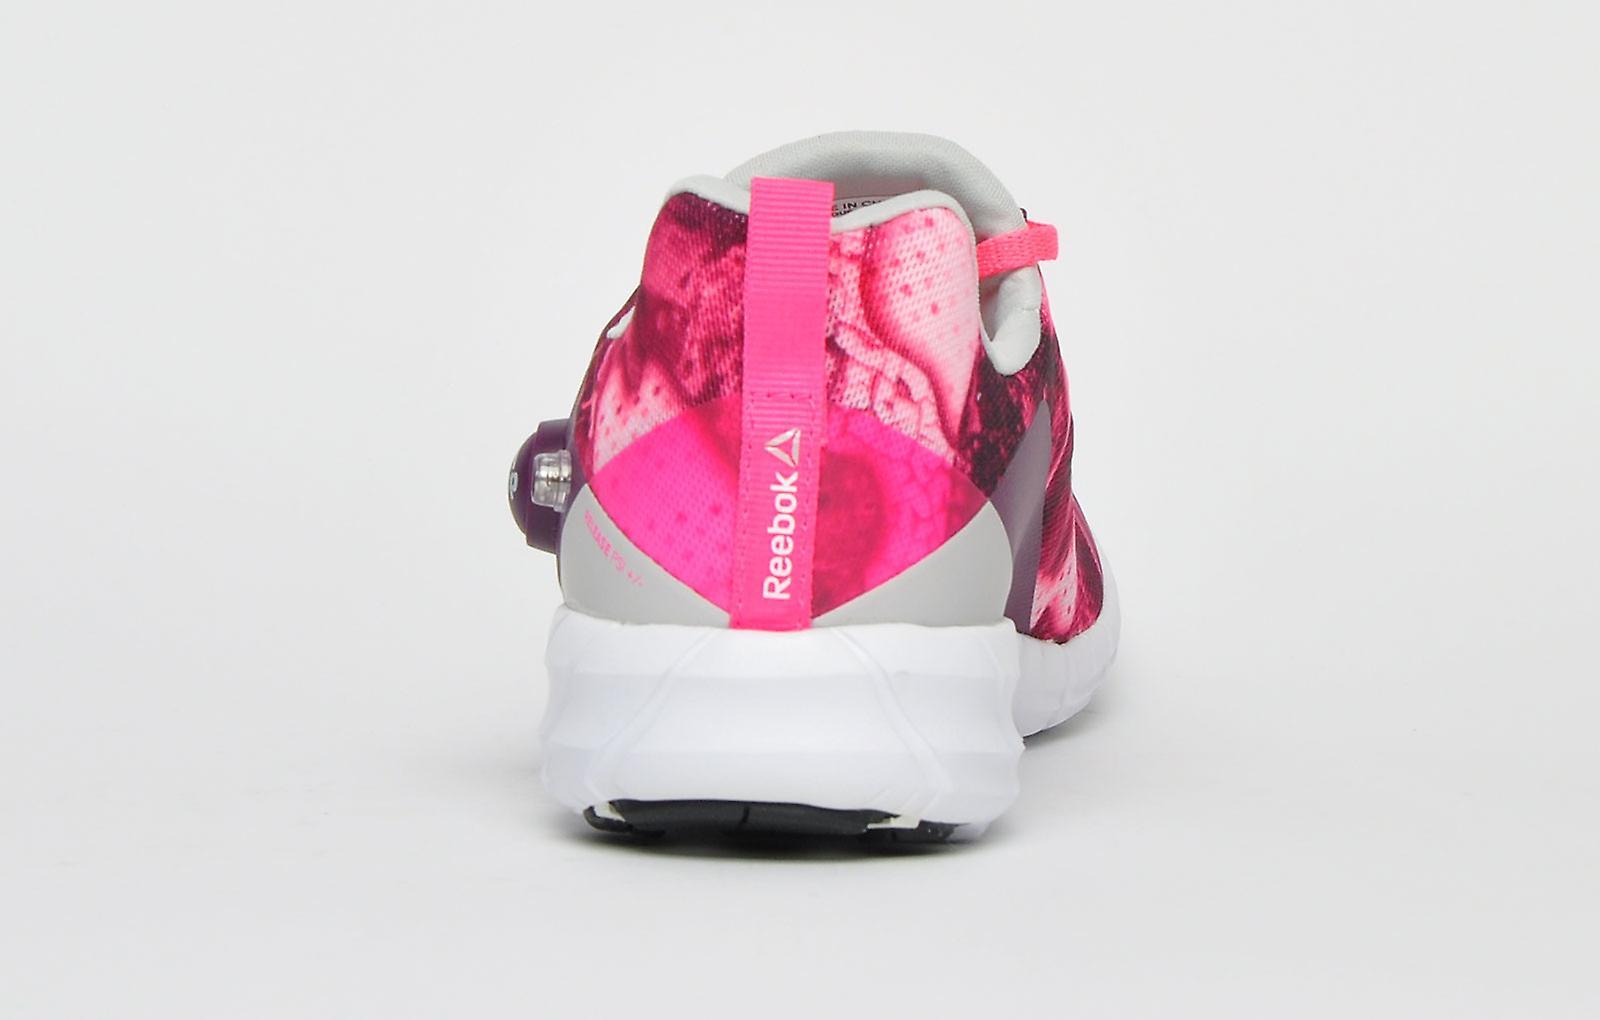 Reebok Z Pump Fusion 2.0 Pink / Orchid / Steel / White / Black